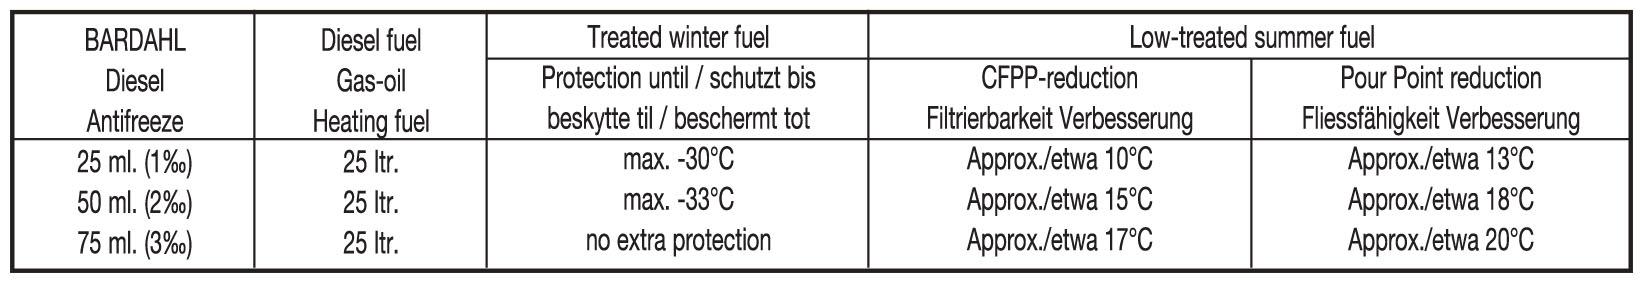 Diesel Antiffreeze - Bardahl Bardahl